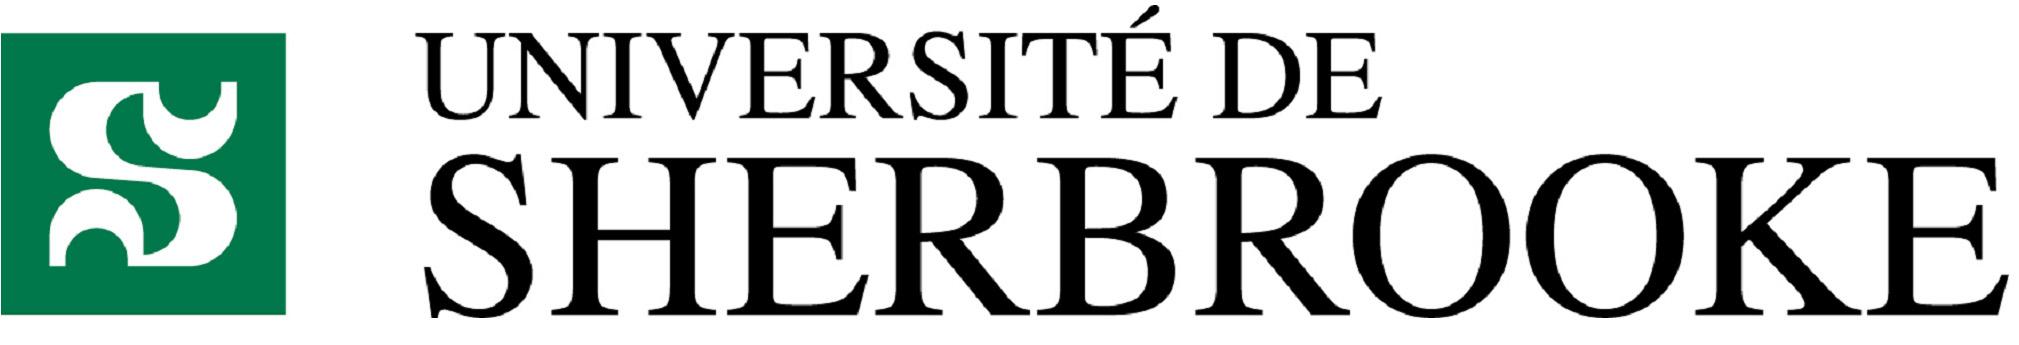 Universite de Sherbrooke